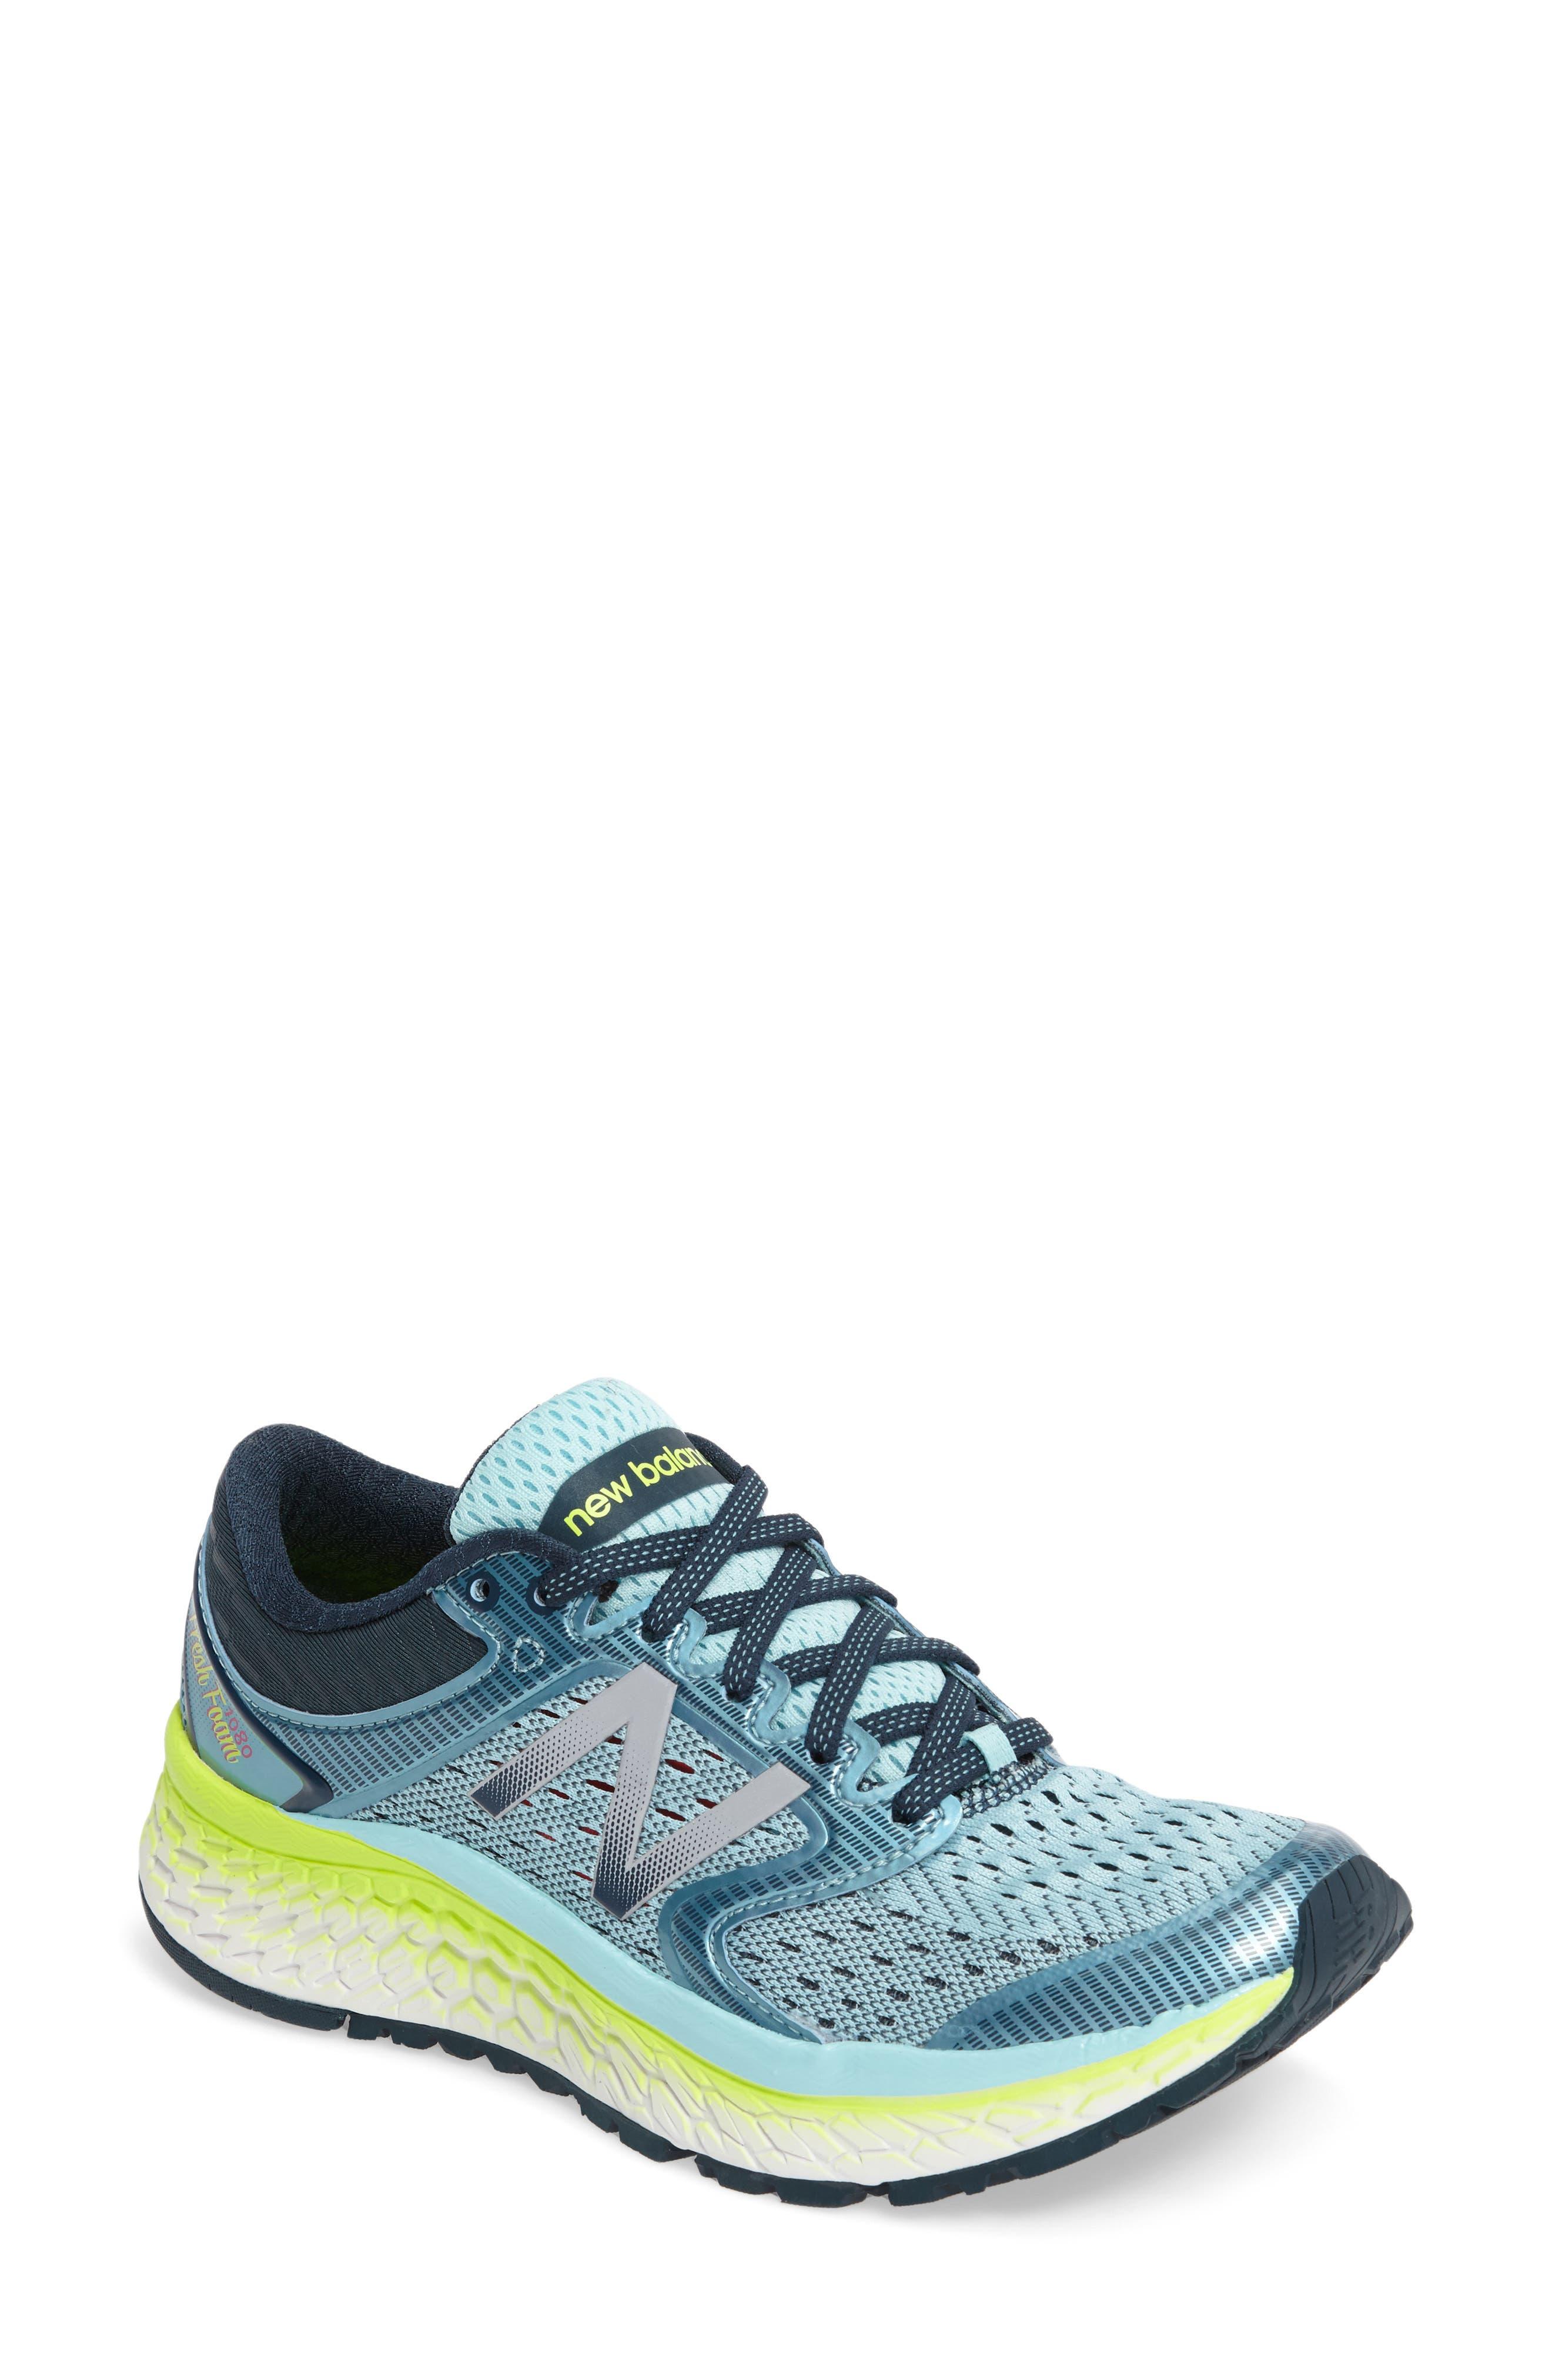 sports shoes f2645 3c56a New Balance '1080 - Fresh Foam' Running Shoe